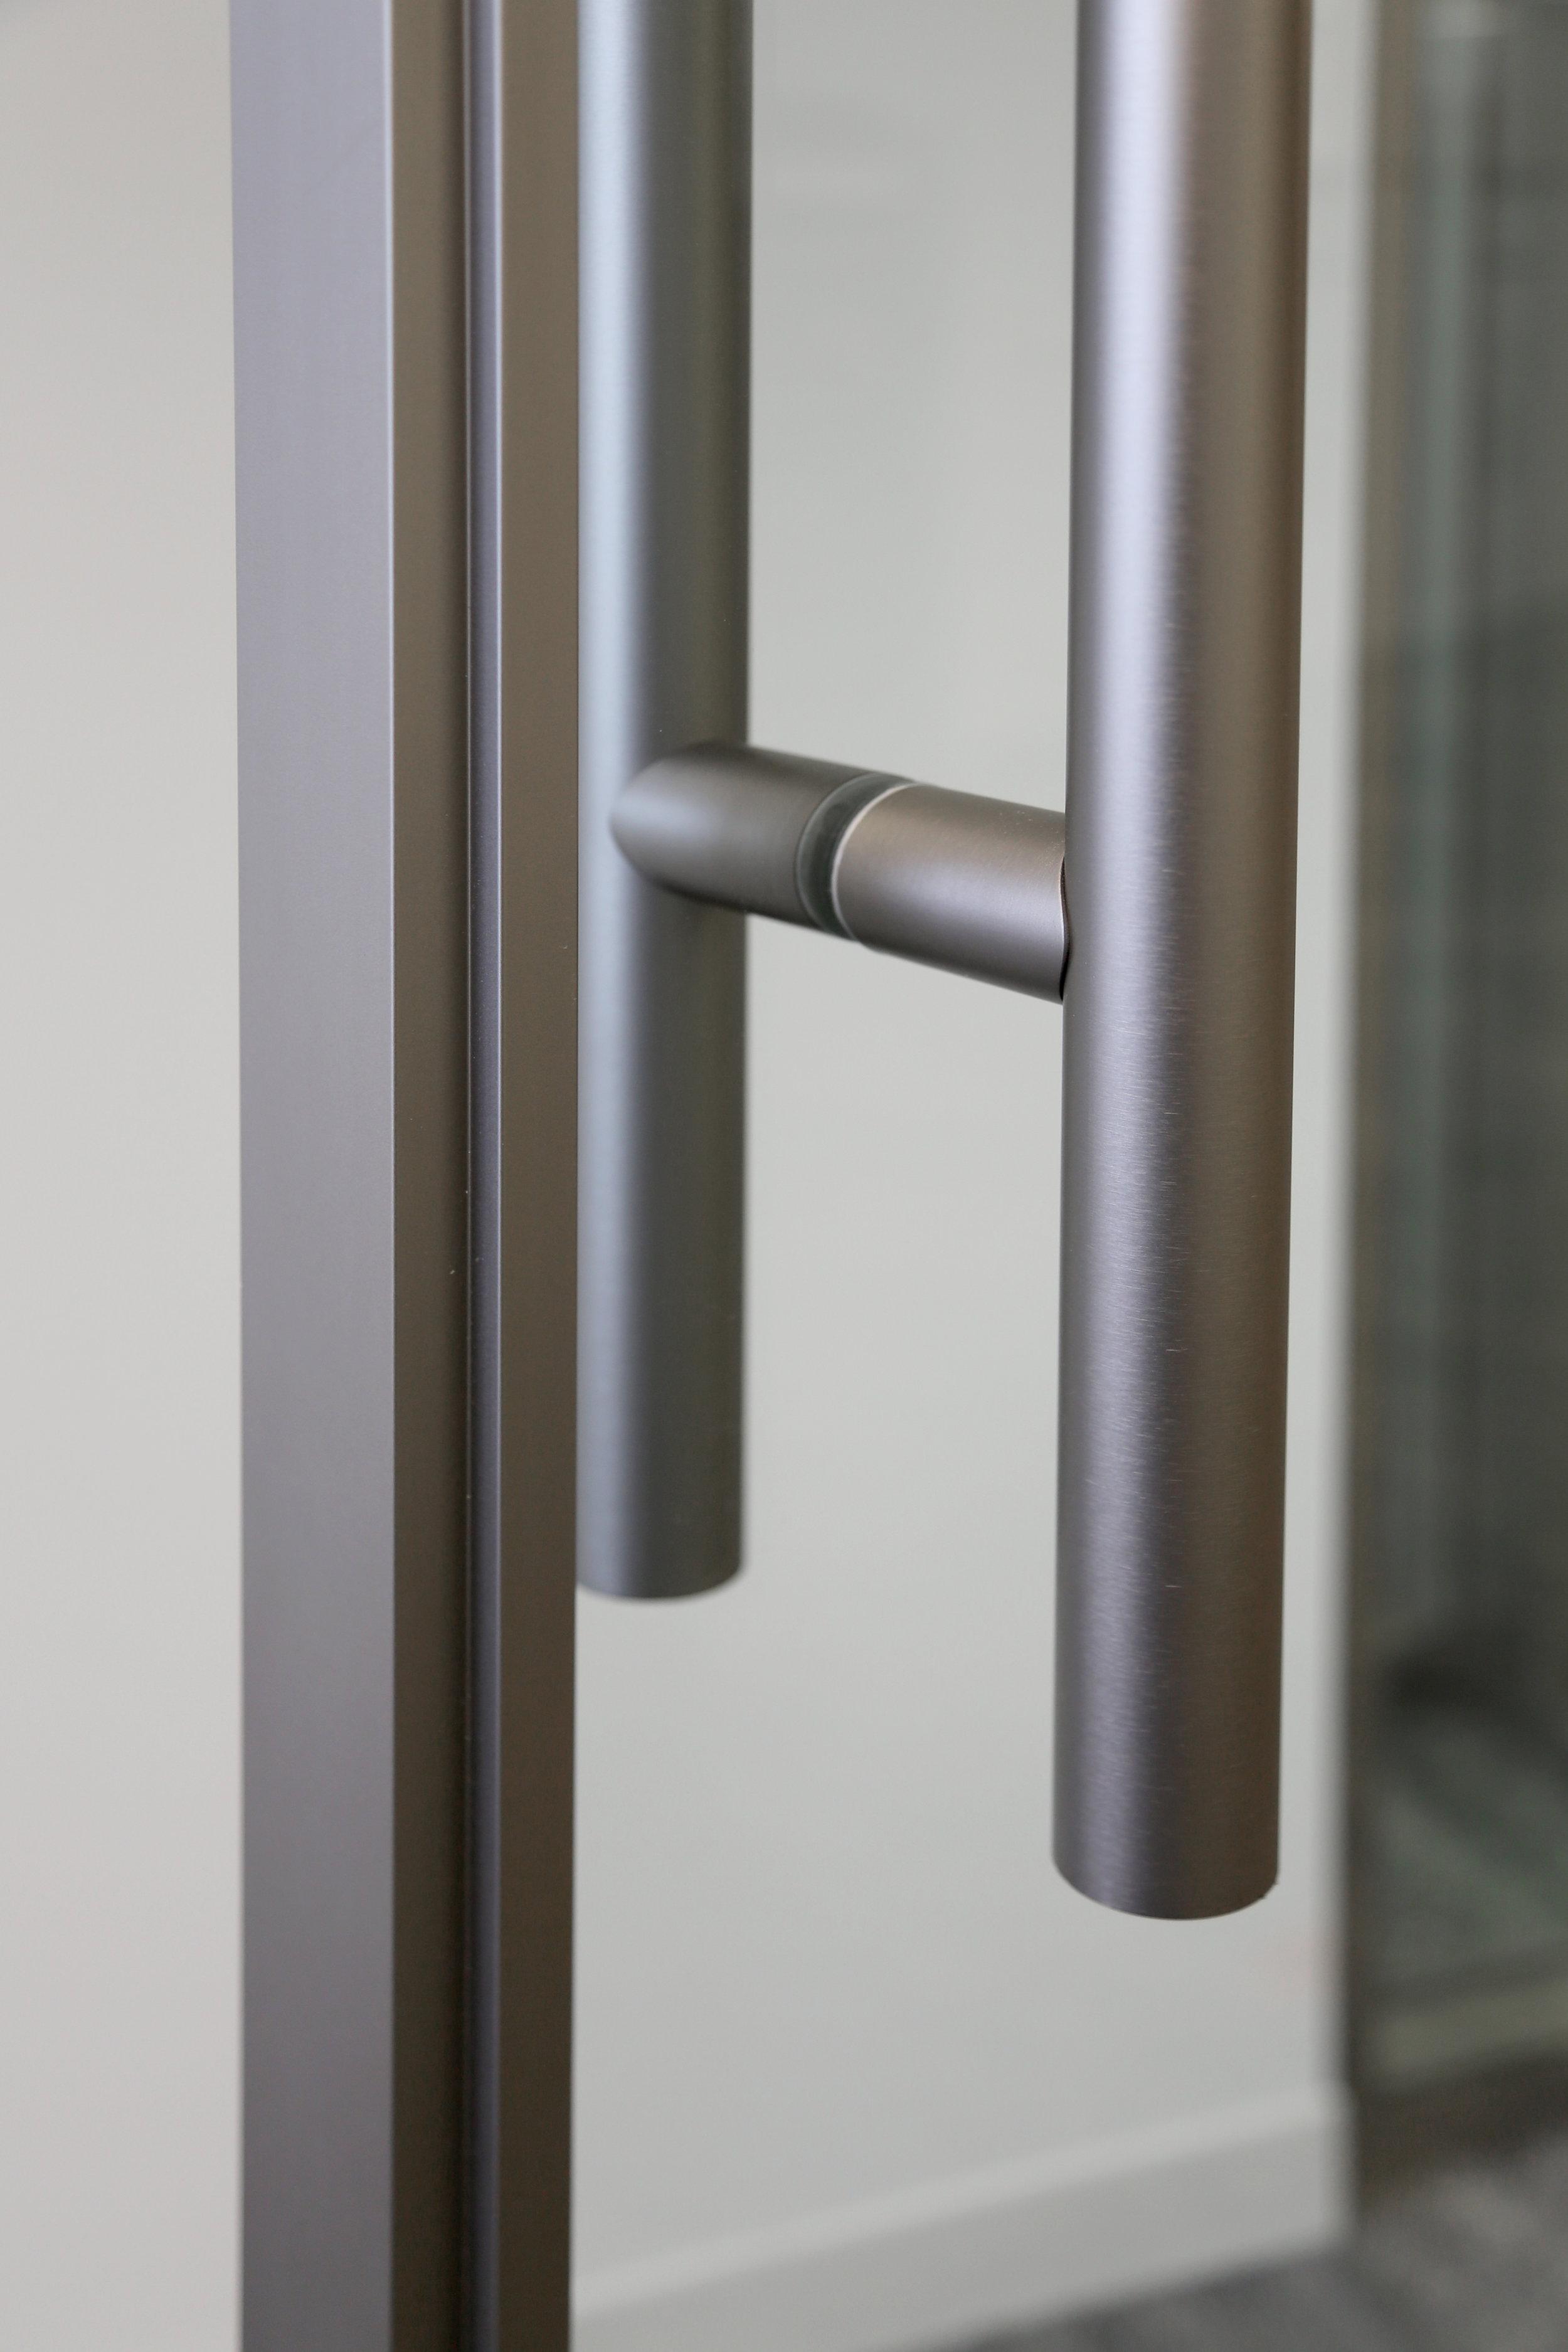 Modernus Ladder Pull Custom Anodized - Spaceworks AI.jpg